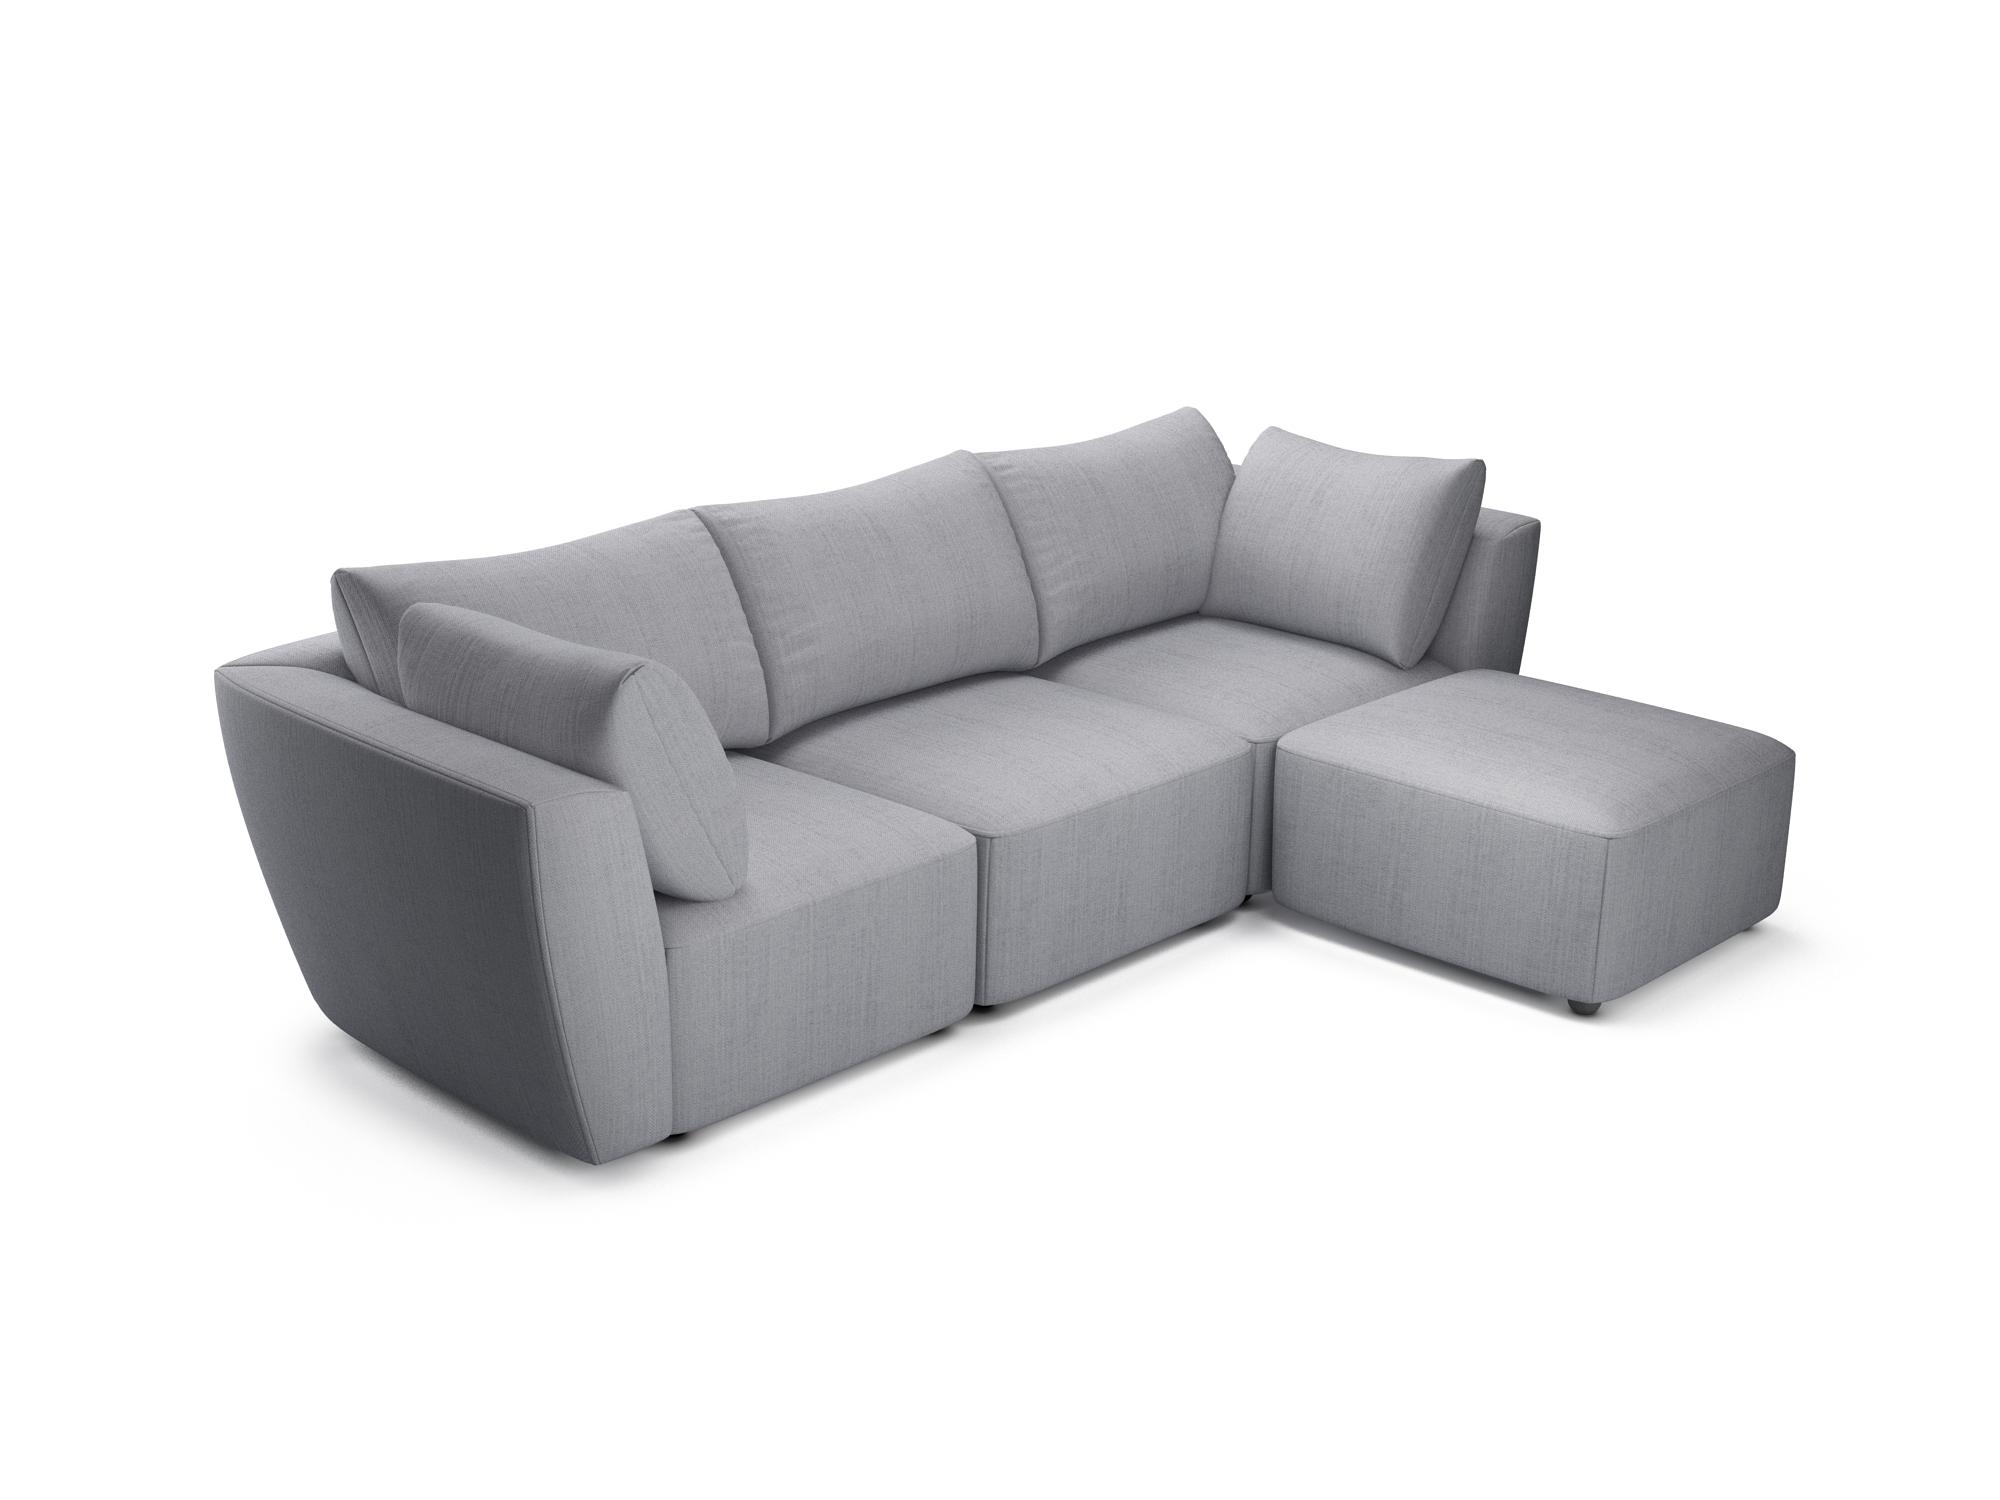 Lottie Grey Sofa